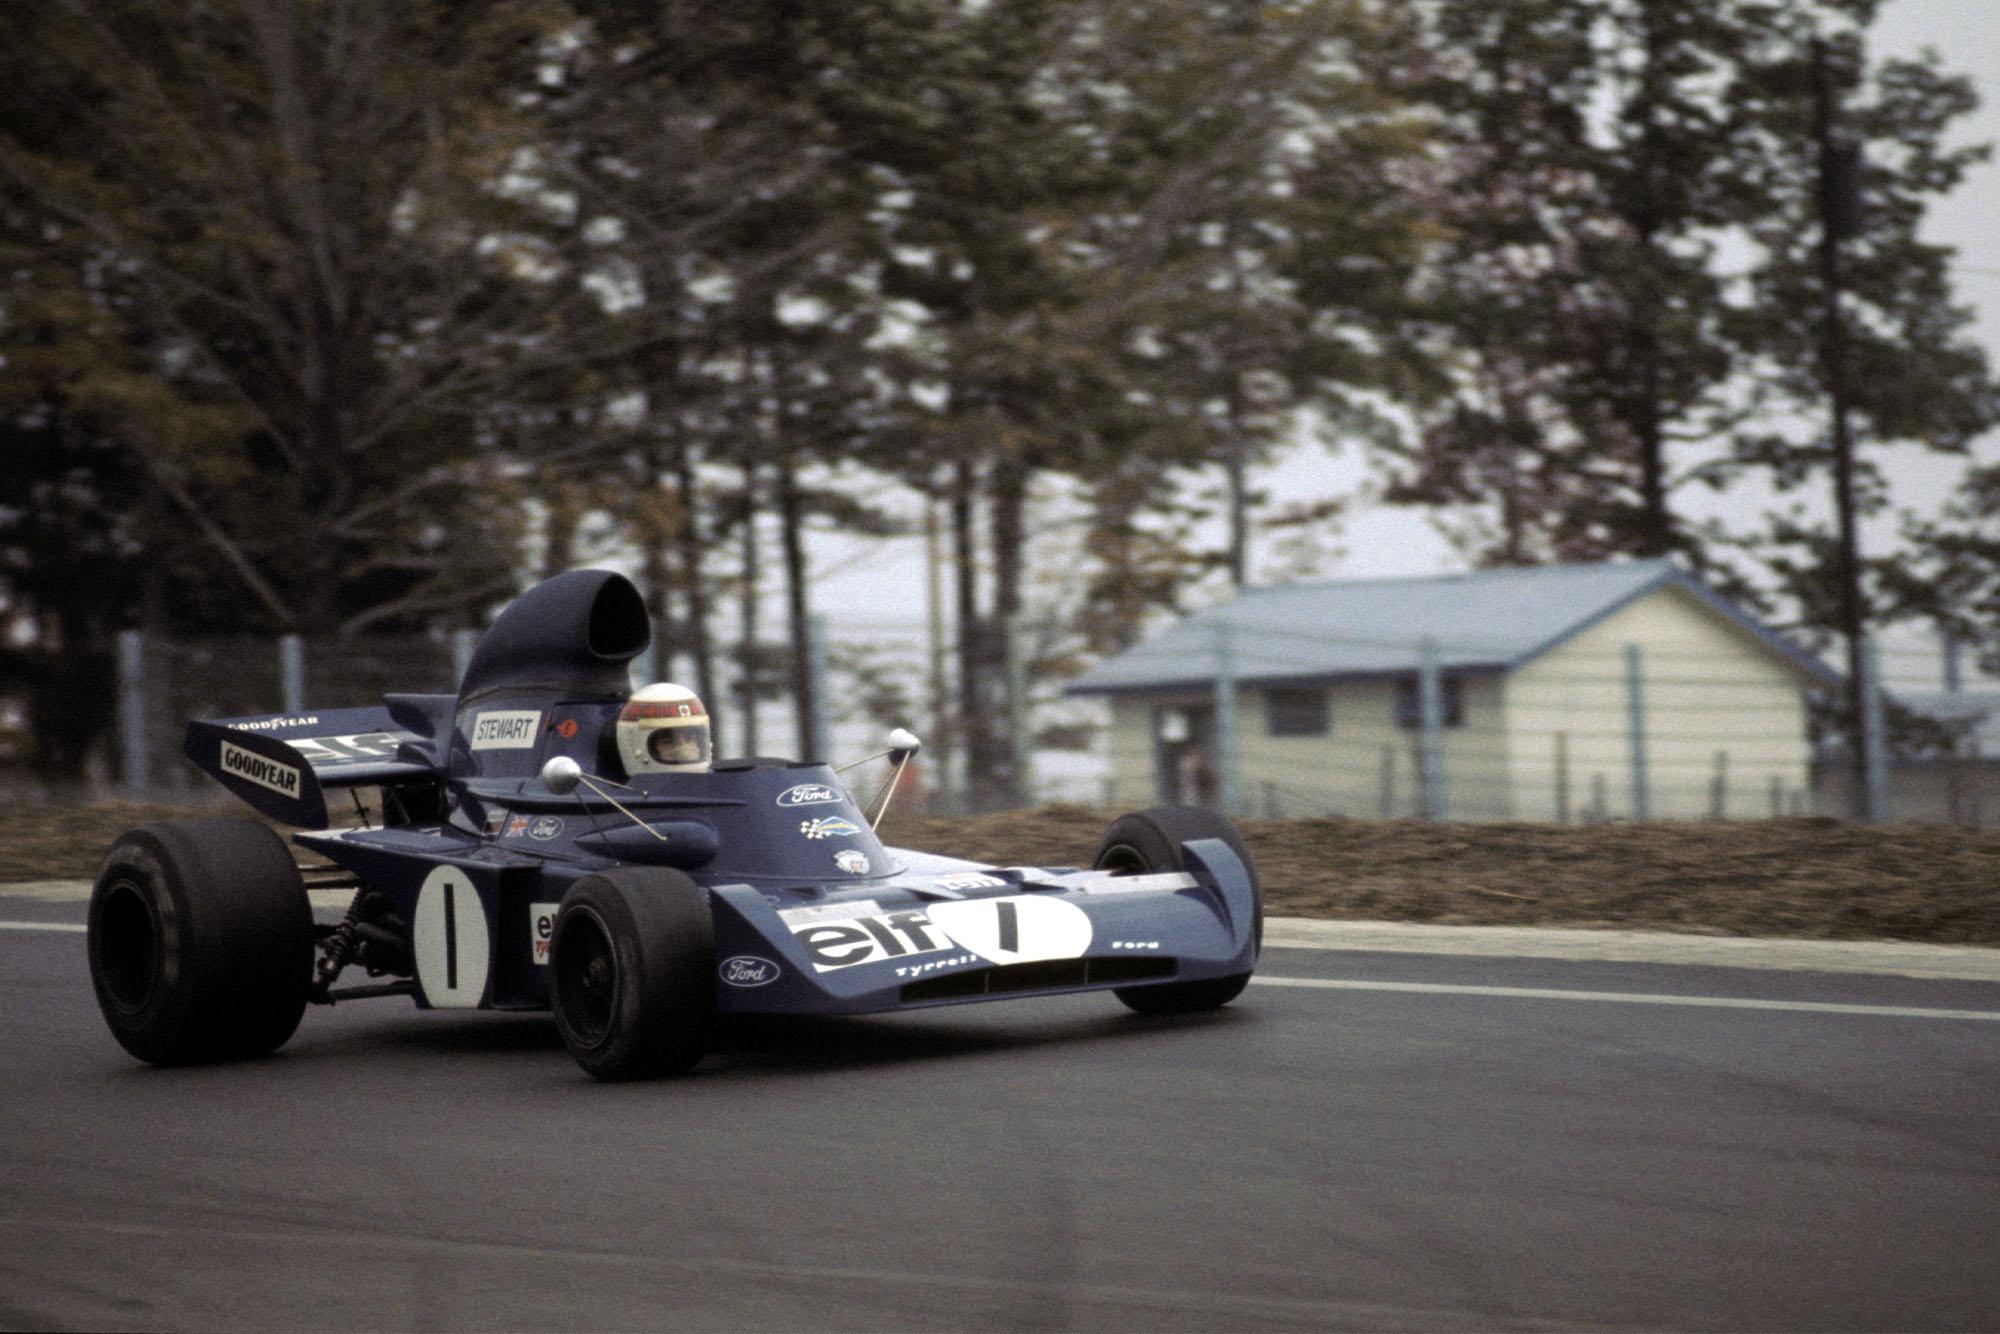 Jackie Stewart driving for Tyrrell the 1972 United States Grand Prix, Watkins Glen.